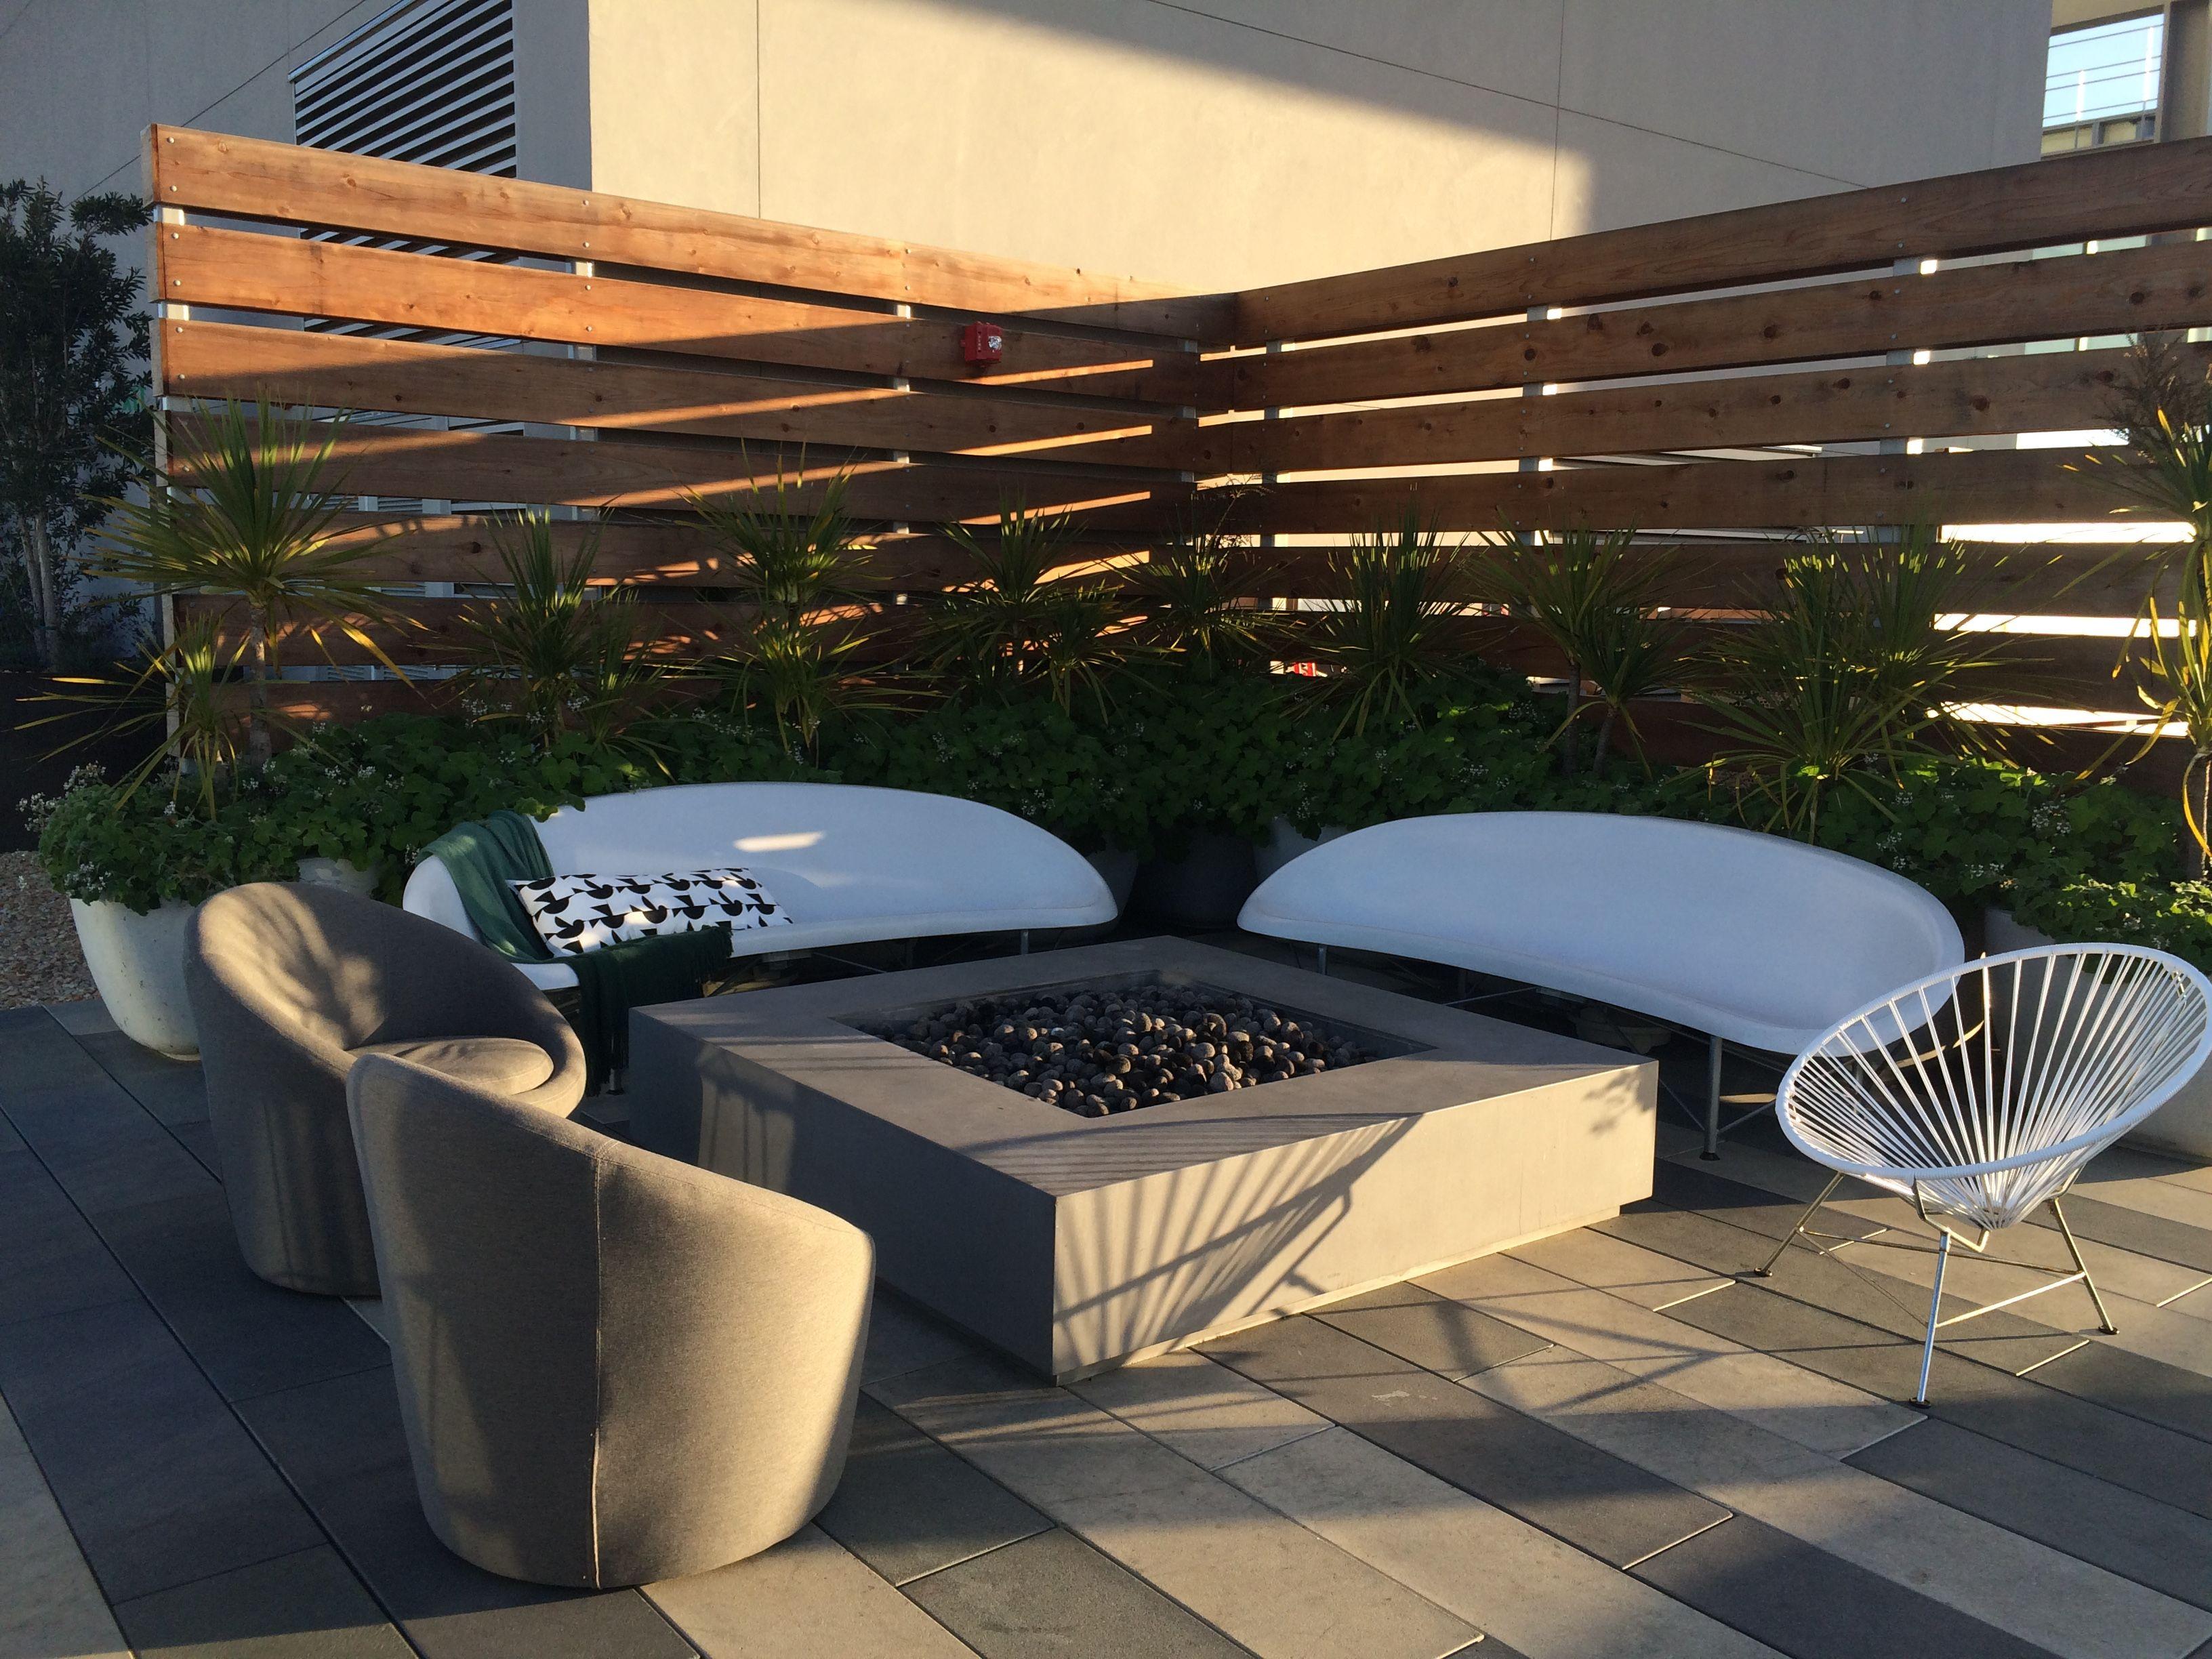 The Helios Lounges On The 100 Van Ness Roof Deck Heatedoutdoorfurniture Hotseat Backyard Patio Designs Patio Design Backyard Patio